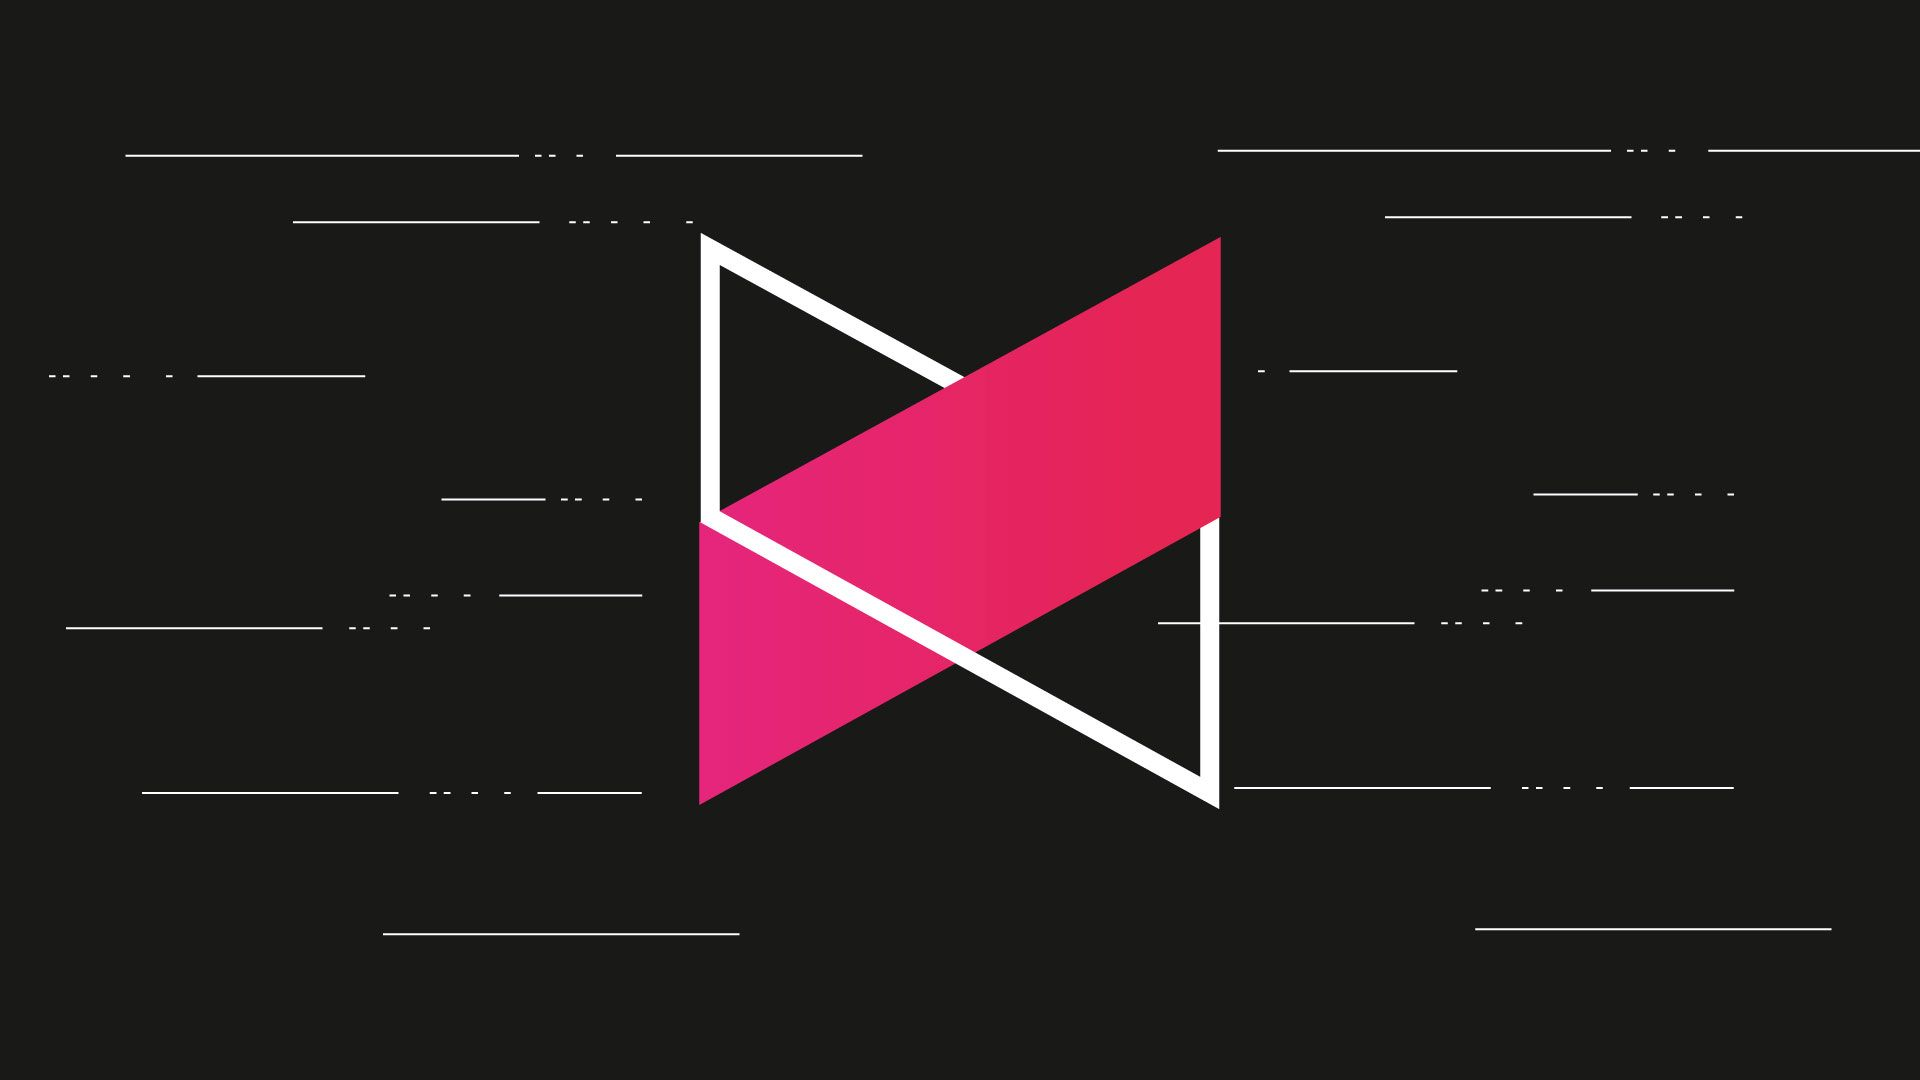 Pin By Andrew Tat On Logo Mood Board In 2019 Youtube Logo Logos